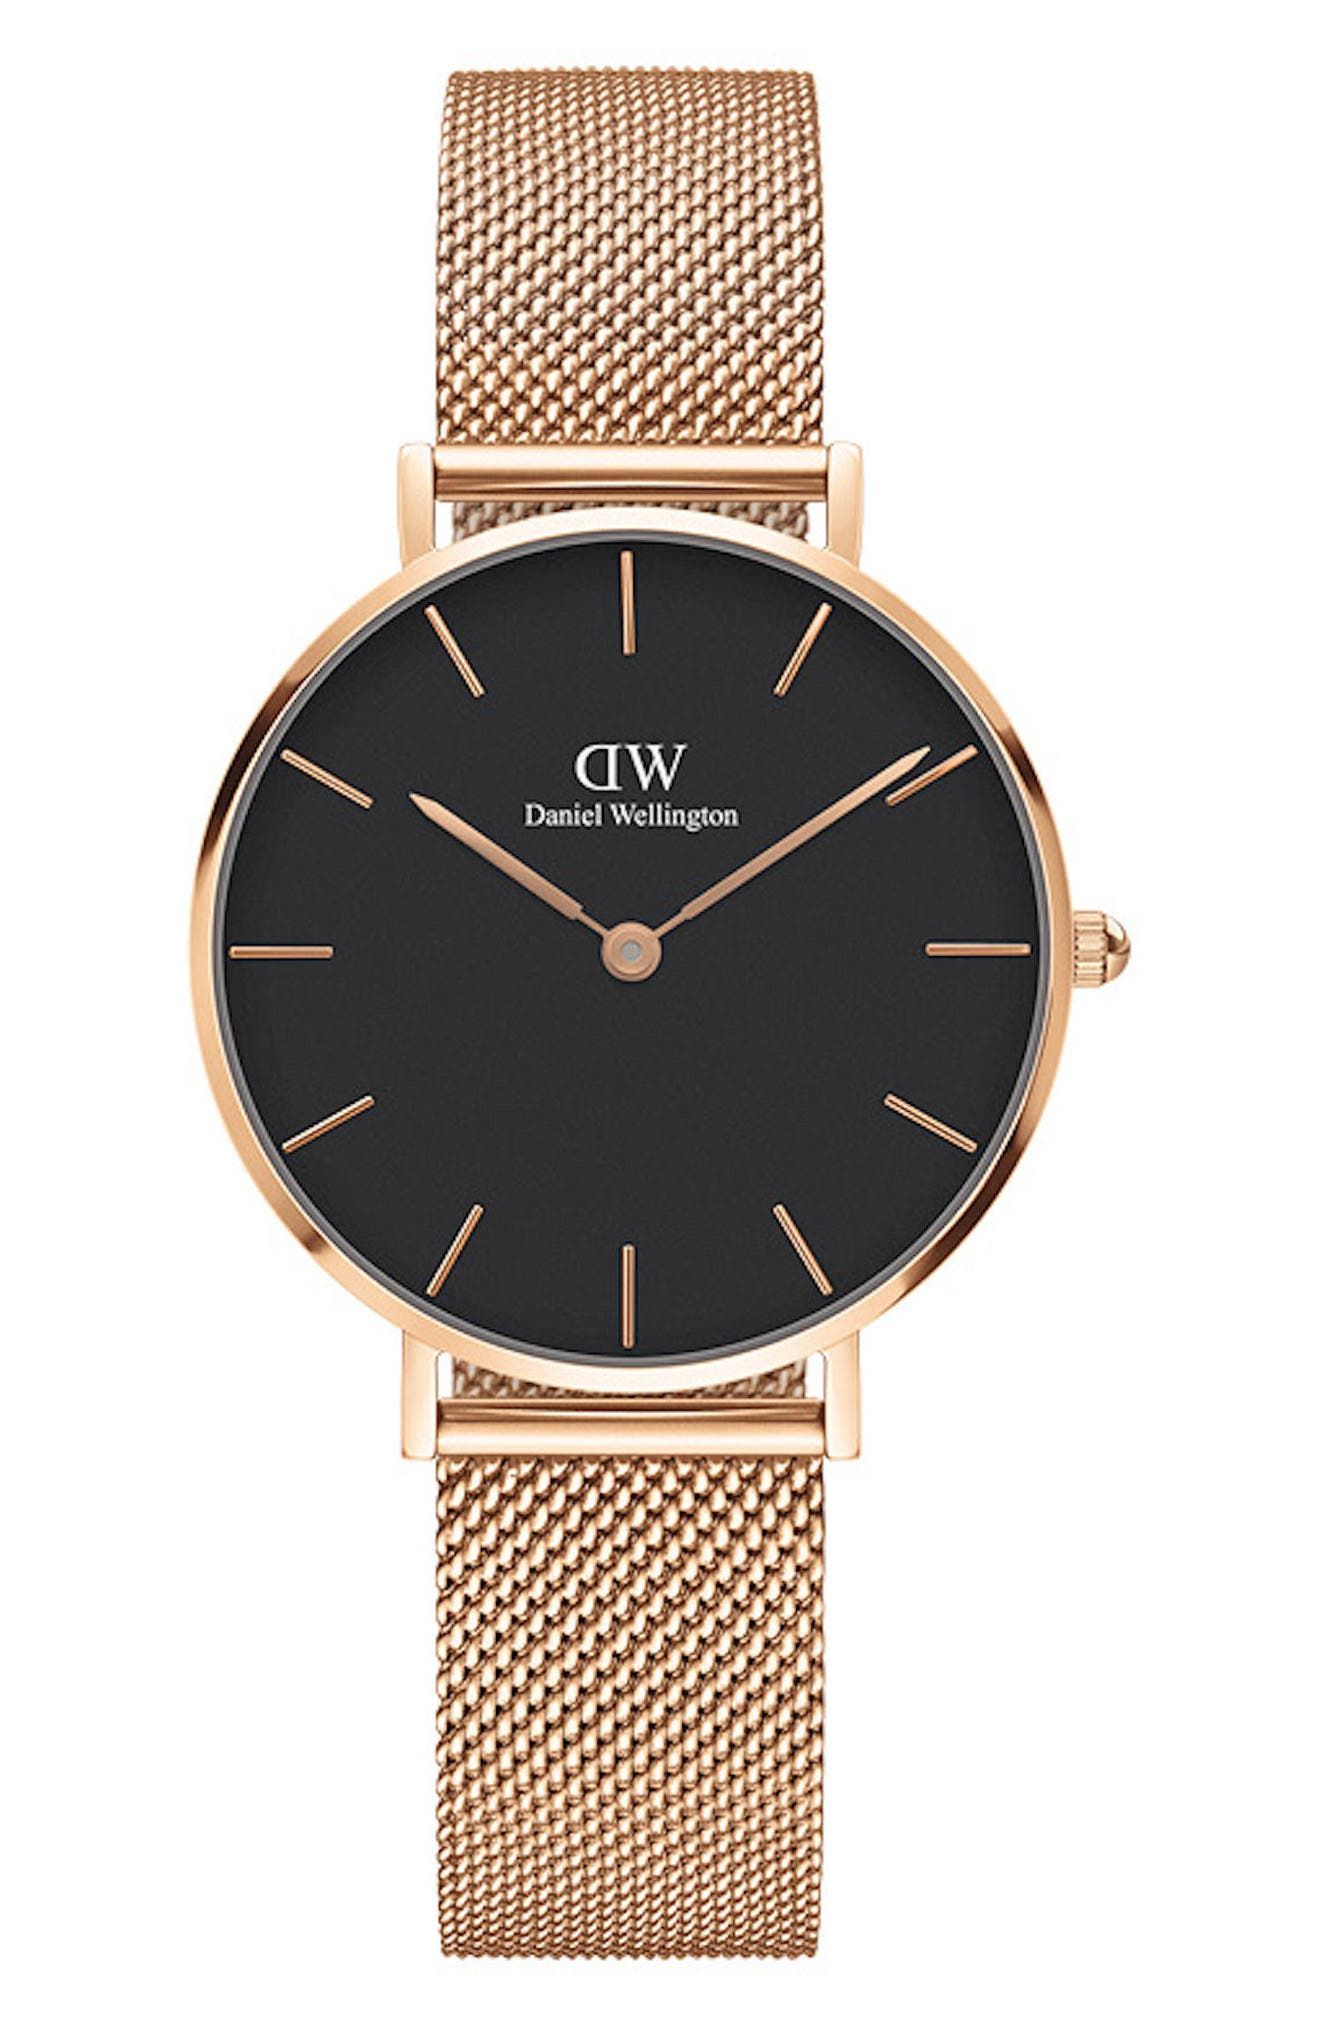 DANIEL WELLINGTON Classic Petite Mesh Strap Watch, 32mm, Main, color, ROSE GOLD/ BLACK / ROSE GOLD